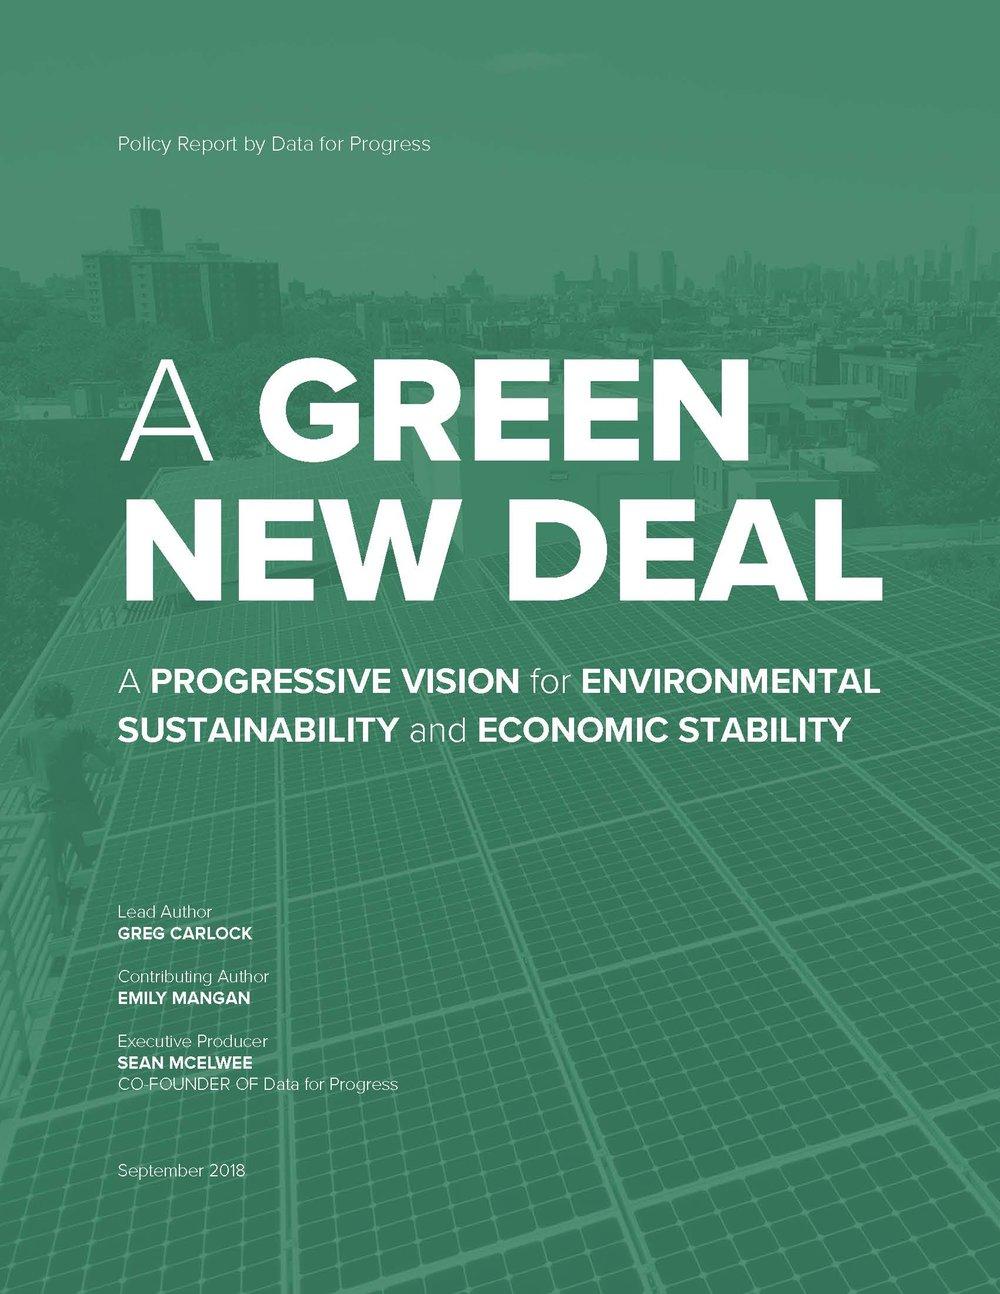 GreenNewDeal_Final_091218 1.jpg